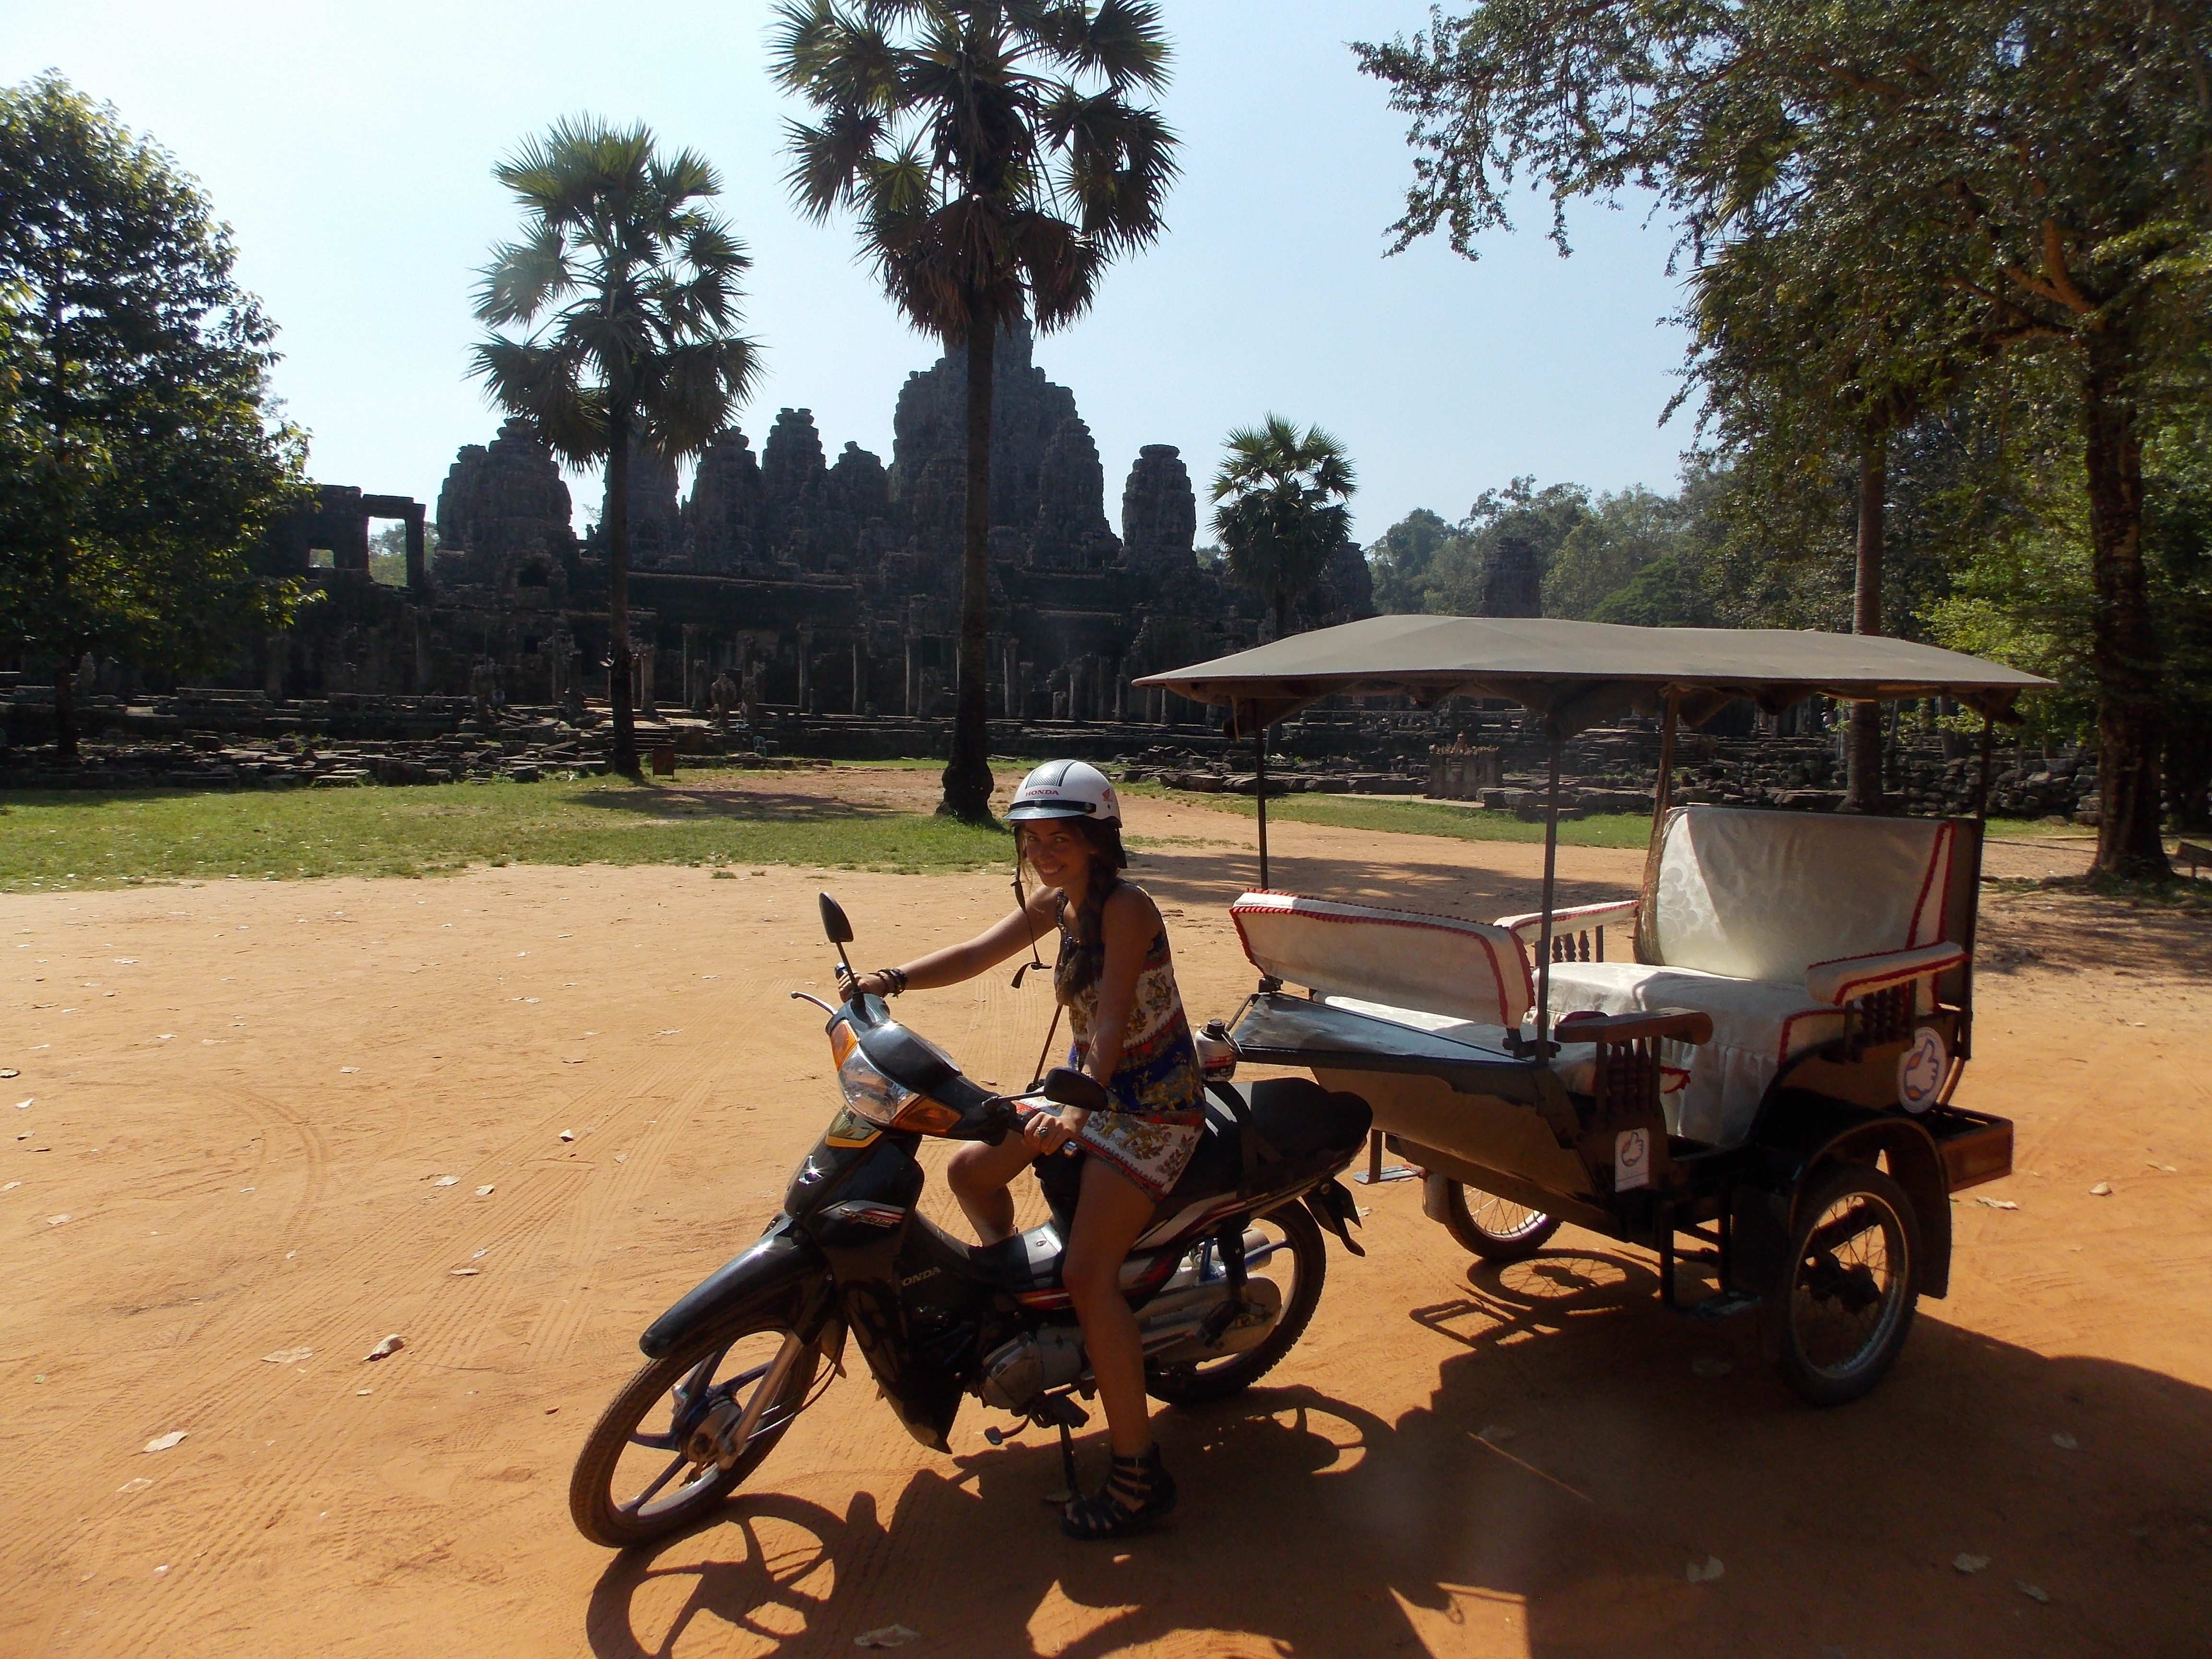 Angkor Wat tuk-tuk